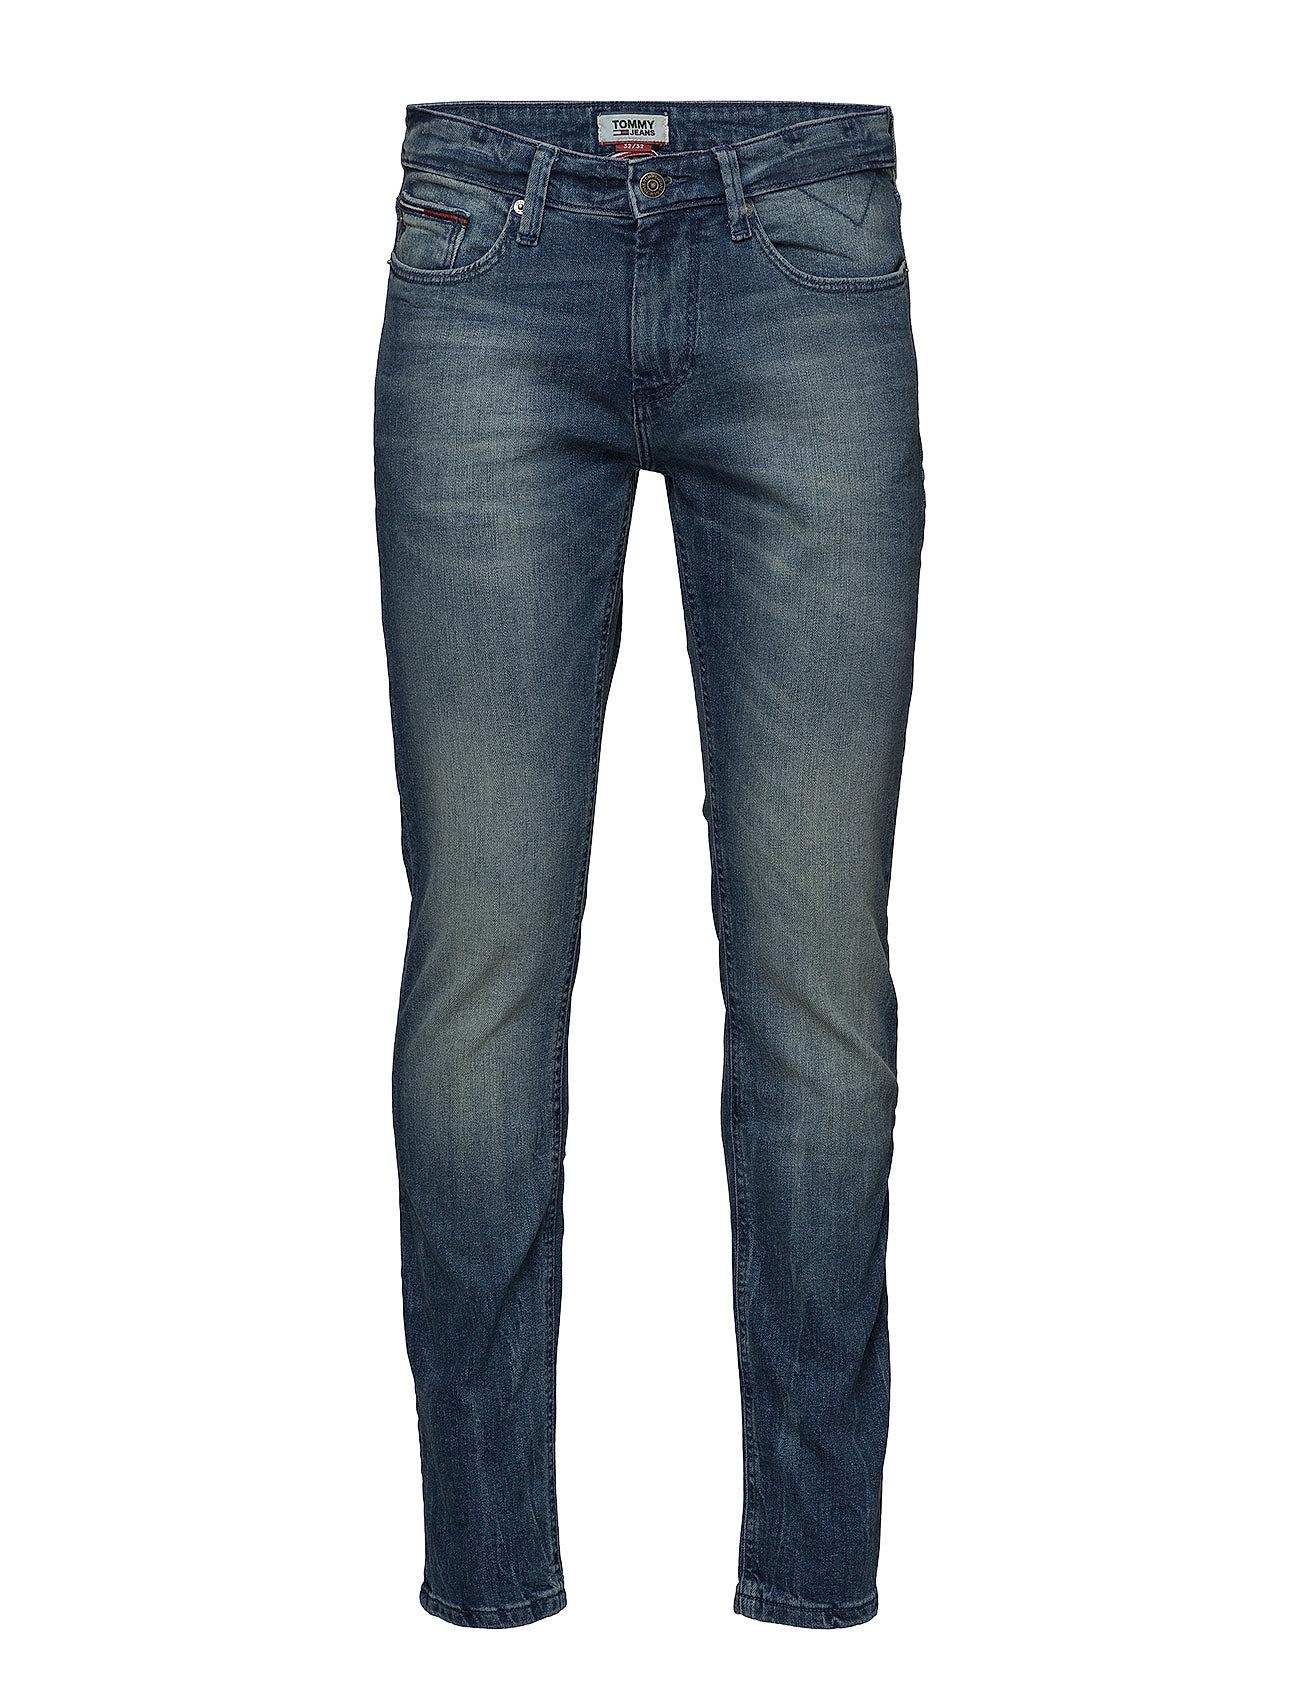 Tommy Jeans SLIM SCANTON BEMB - BERRY MID BLUE COMFORT